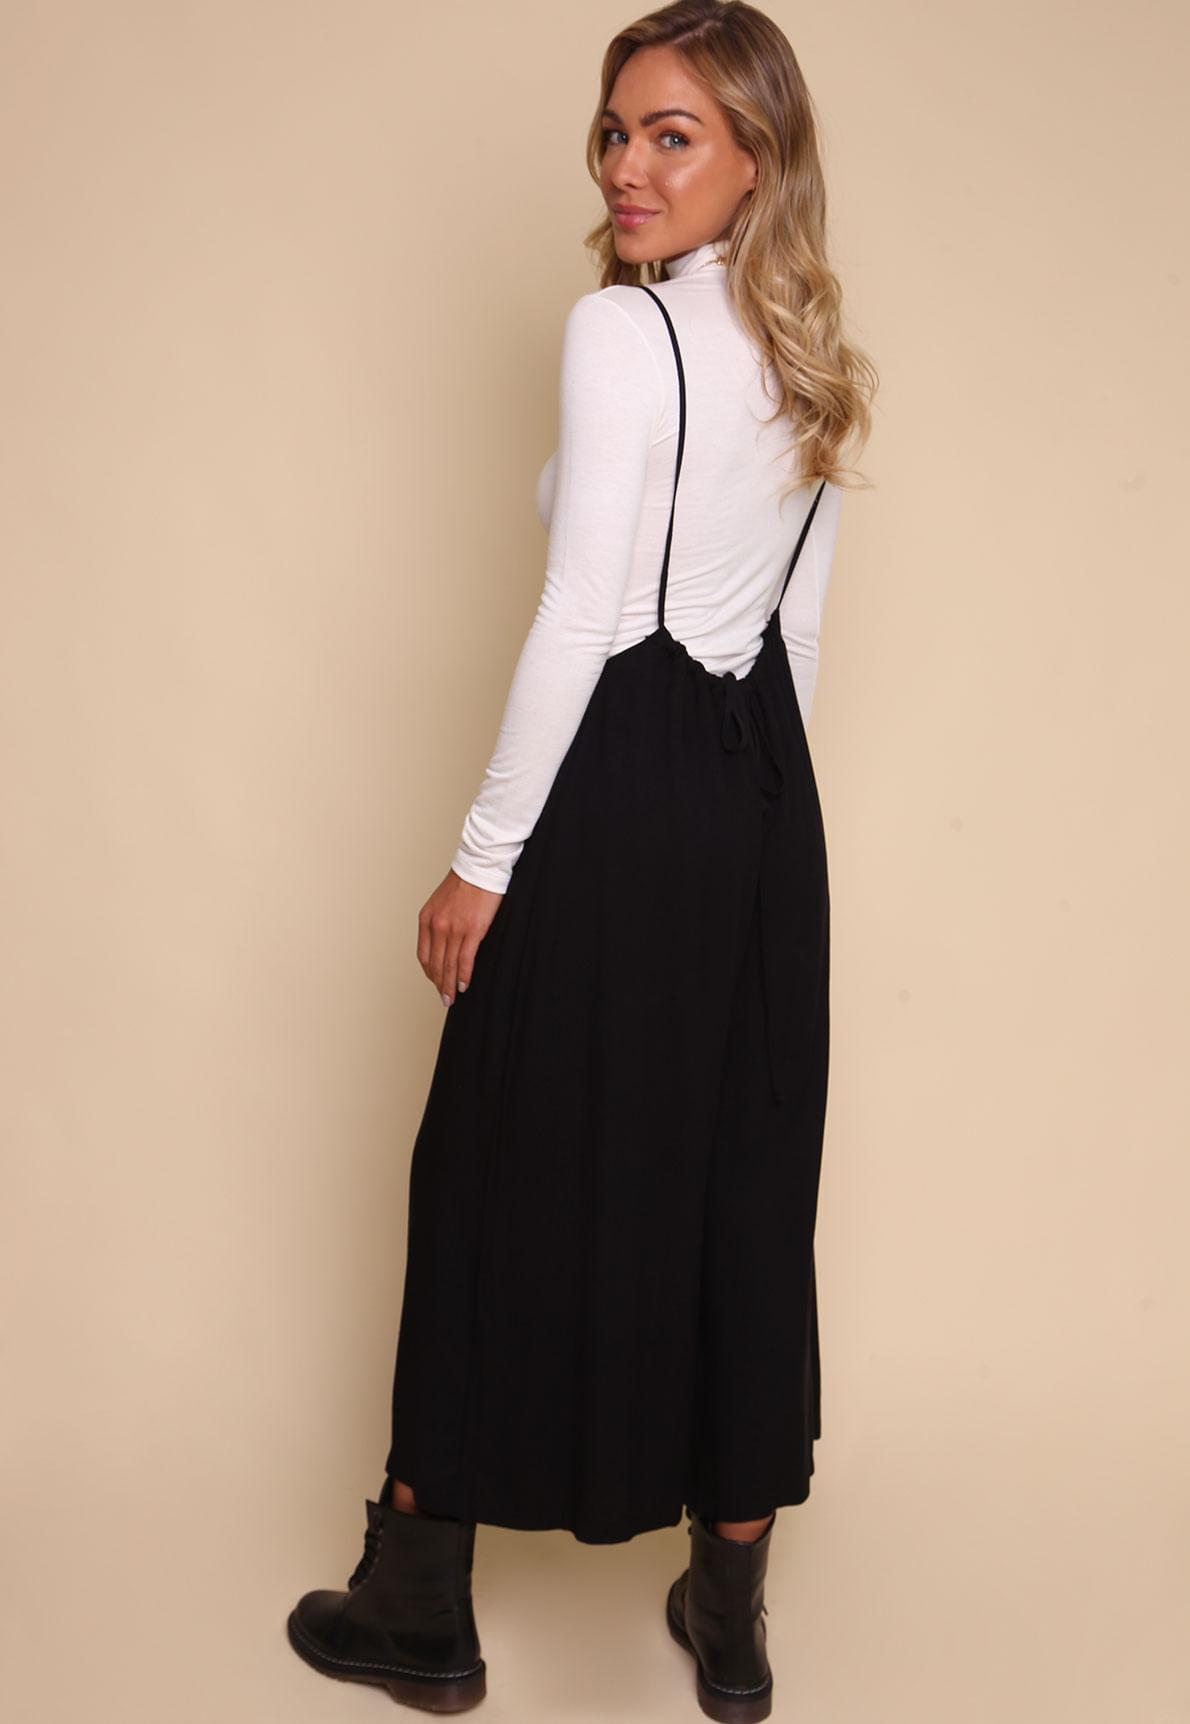 30485-macacao-pantalona-preto-raissa-mundo-lolita-04